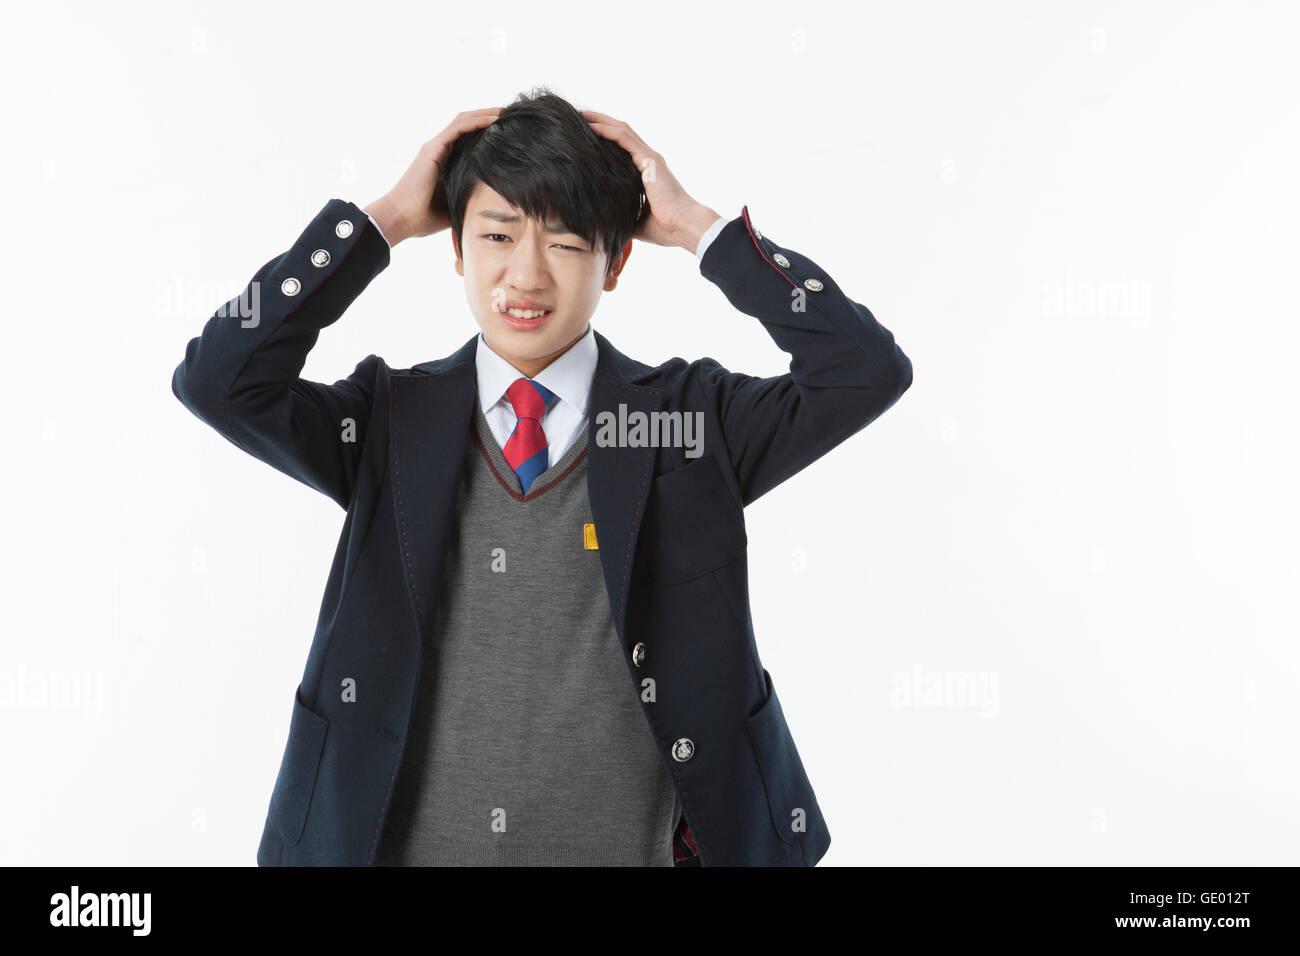 Portrait of stressful school boy - Stock Image